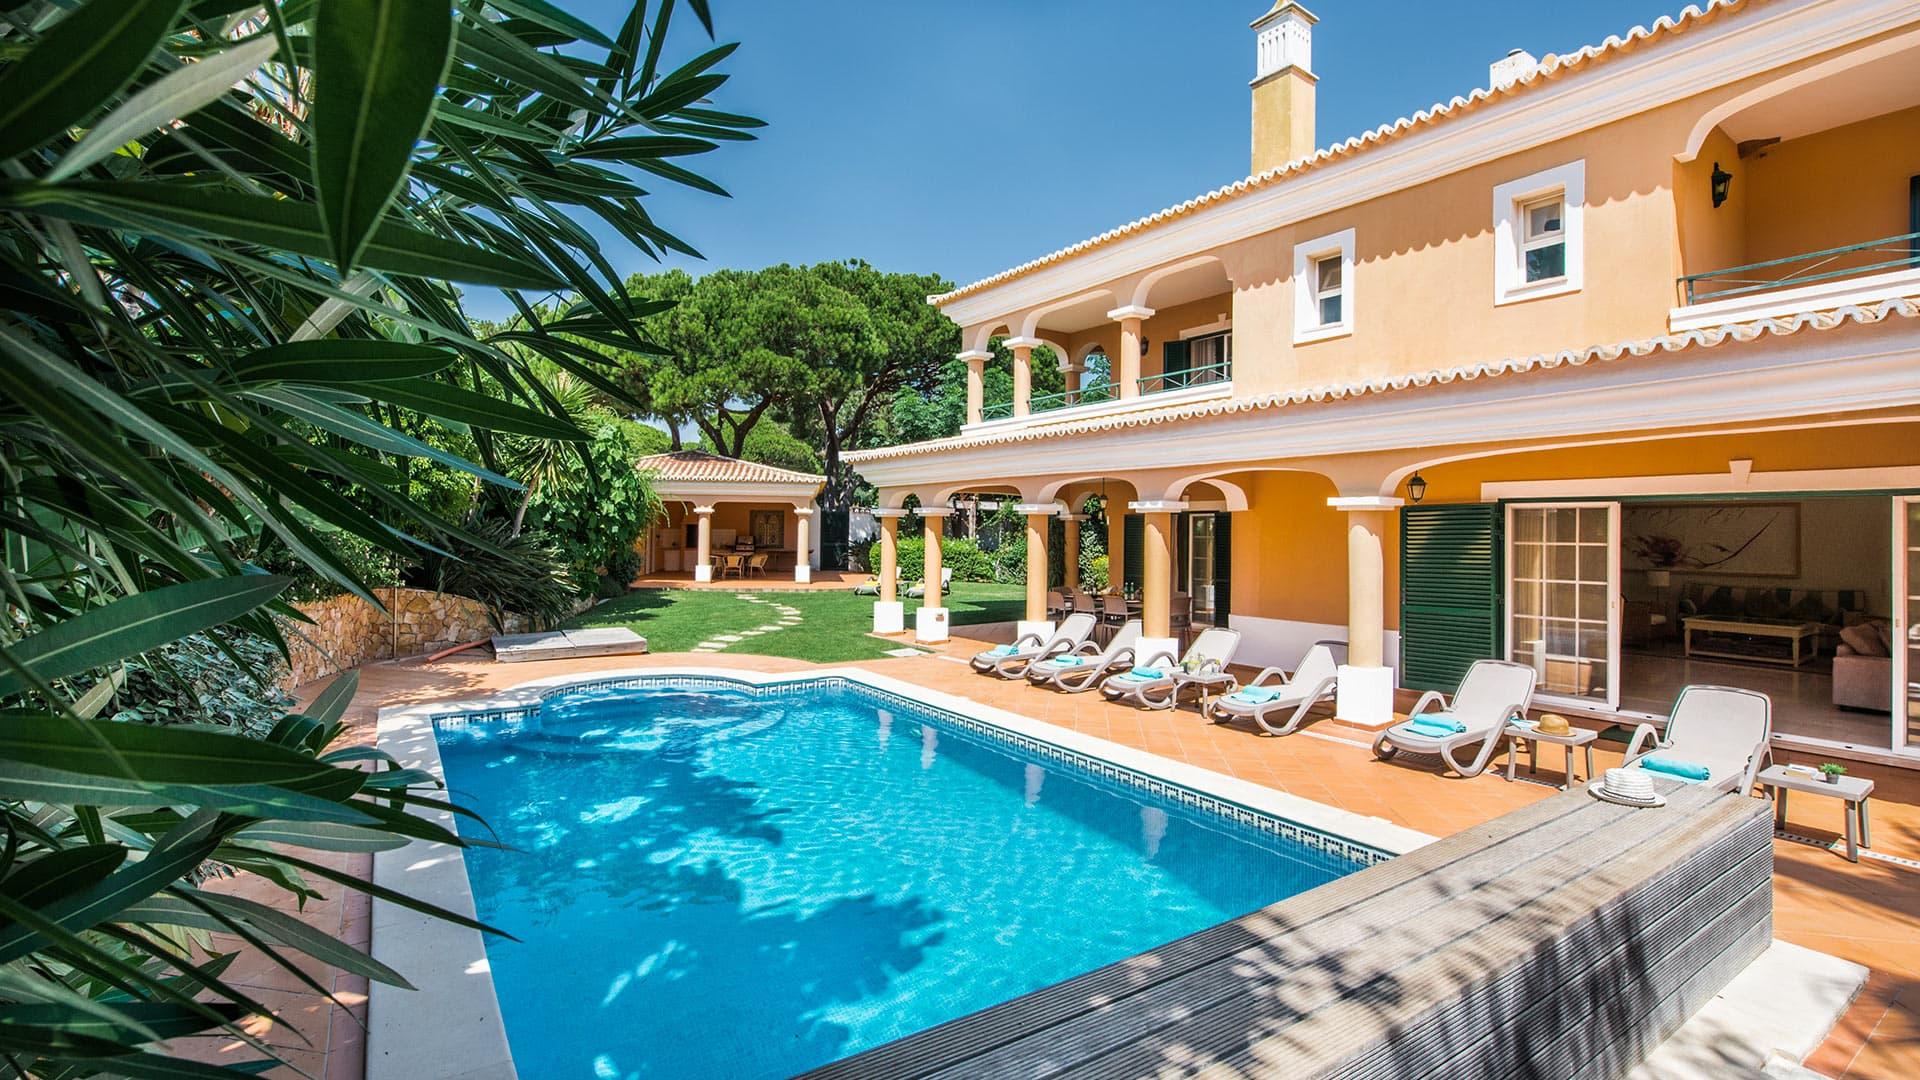 Villa Lofi - Villa rental in Algarve, Vale do Lobo  Villanovo